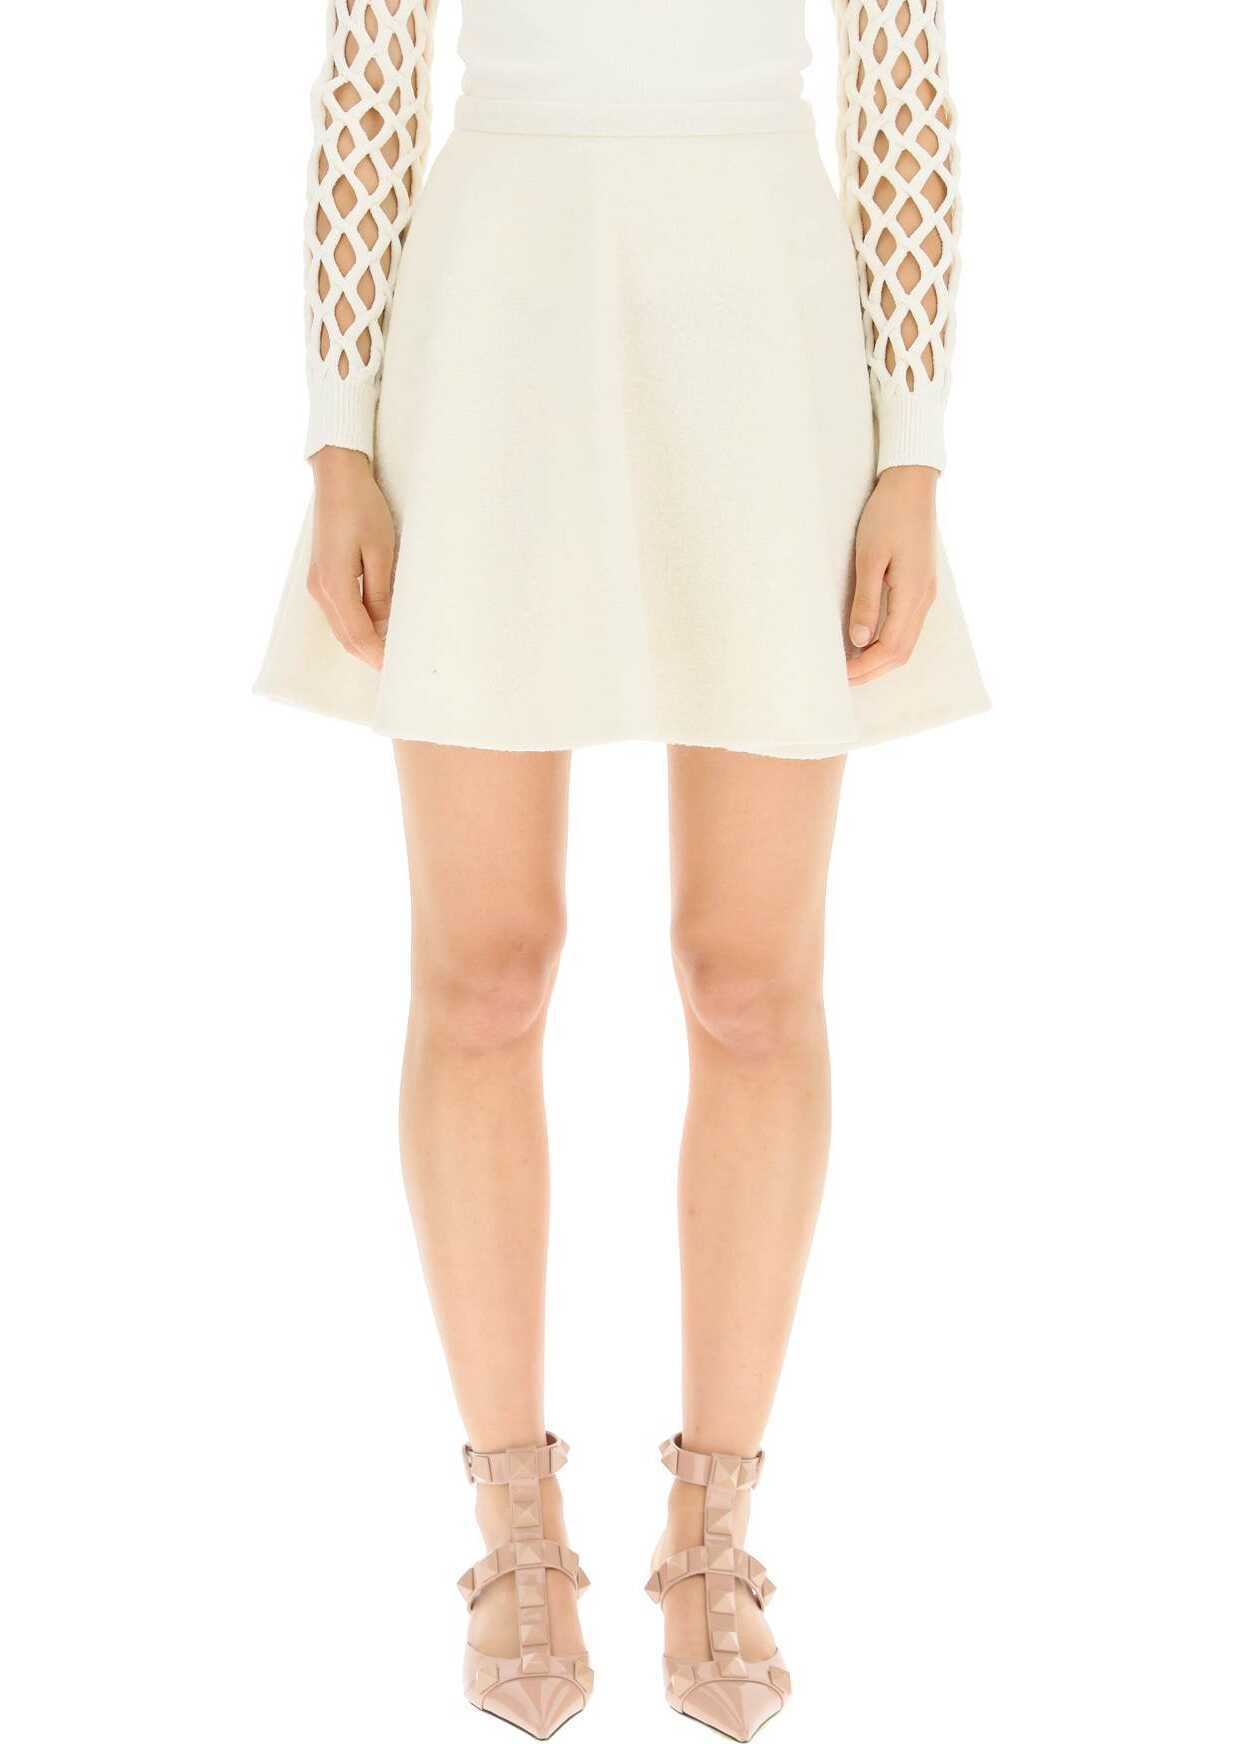 Valentino Garavani Boucle' Couture Mini Skirt WB0RA8826R6 AVORIO image0